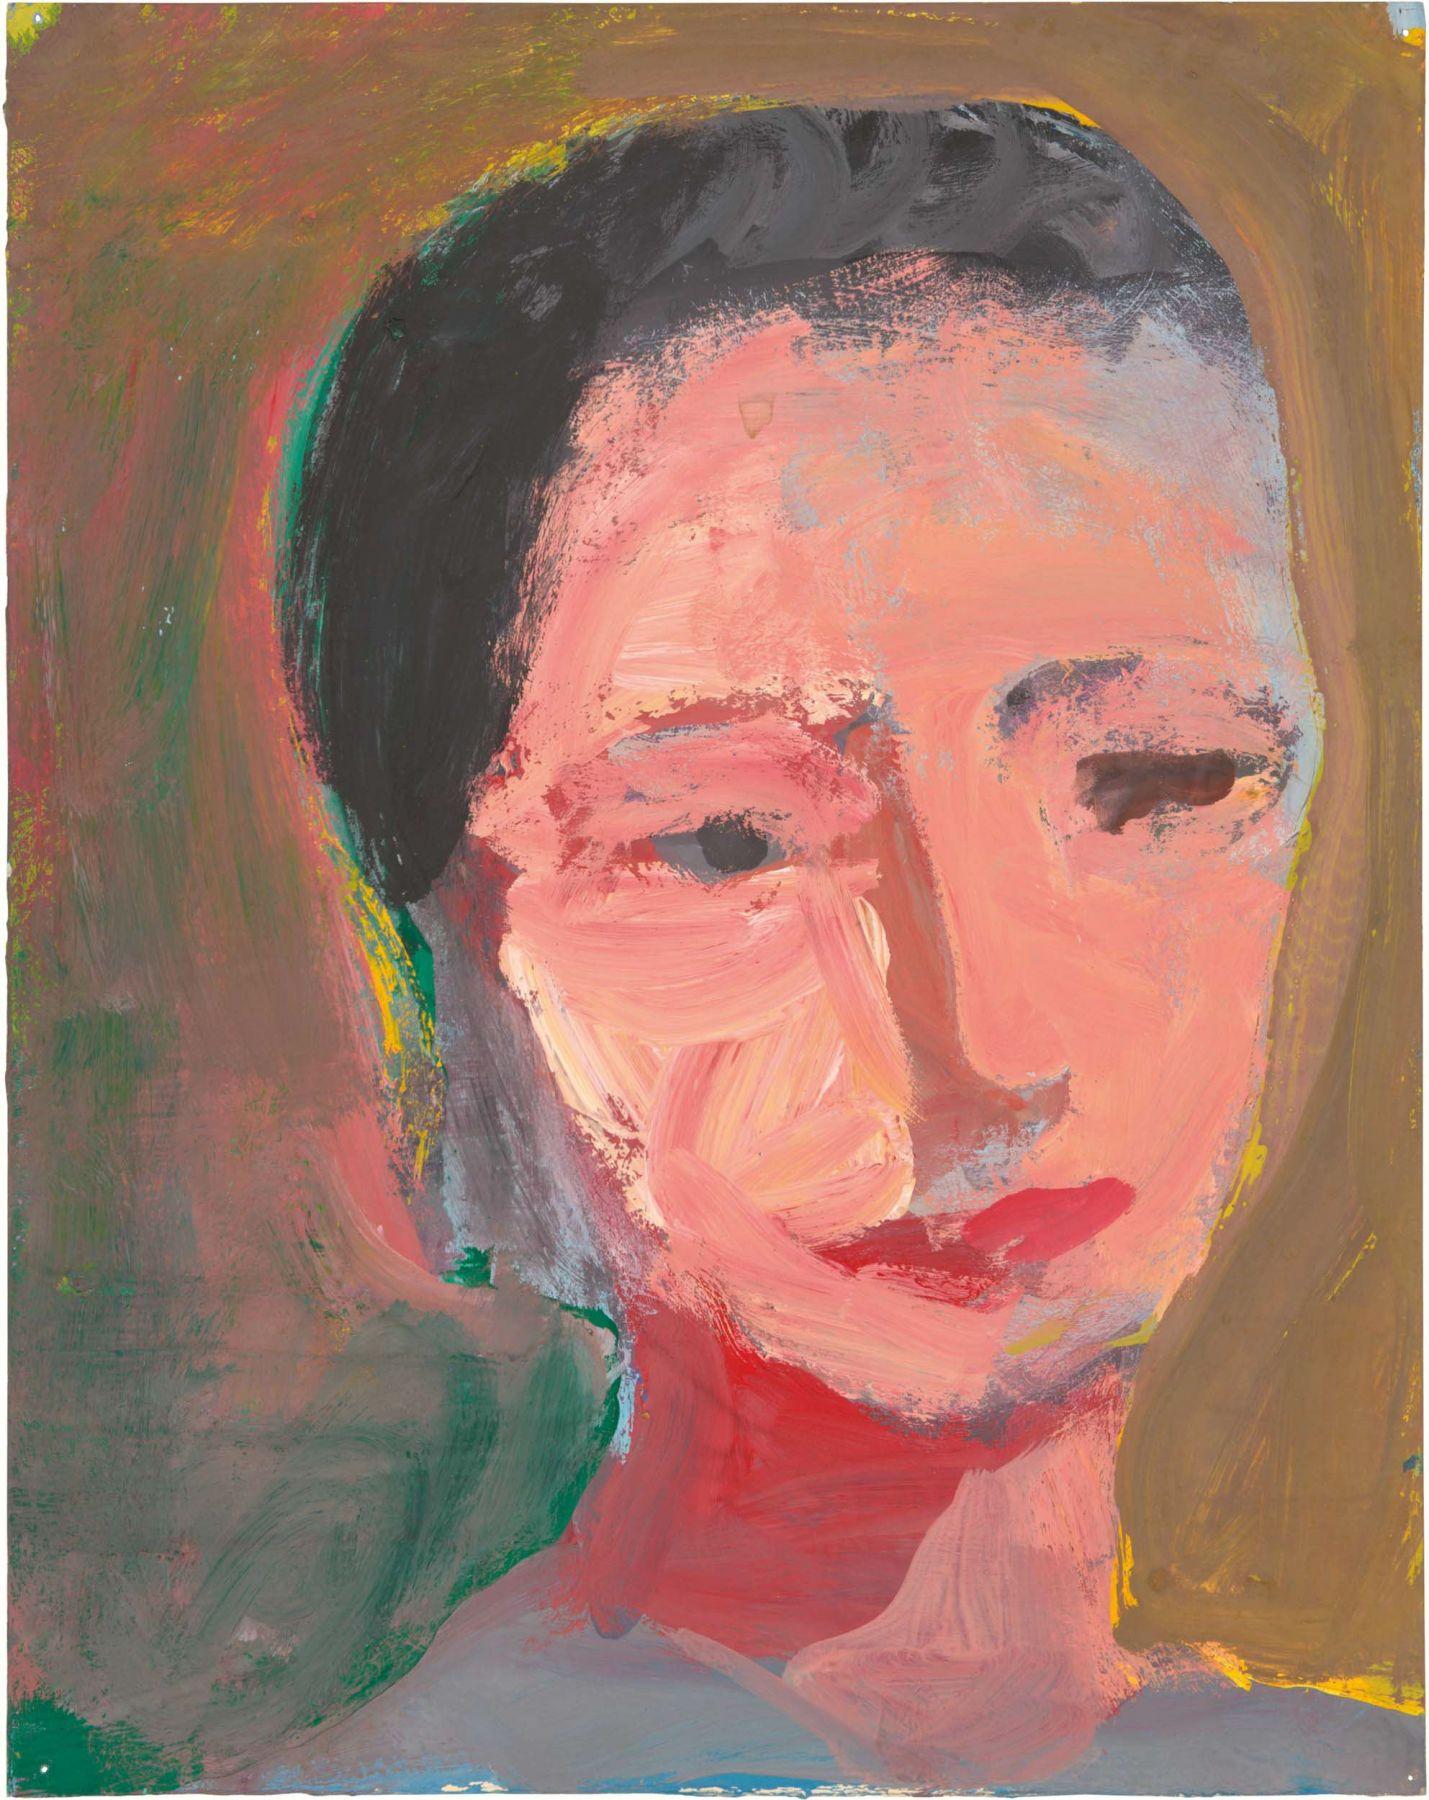 Untitled (CR no. 3092), c. 1957–63